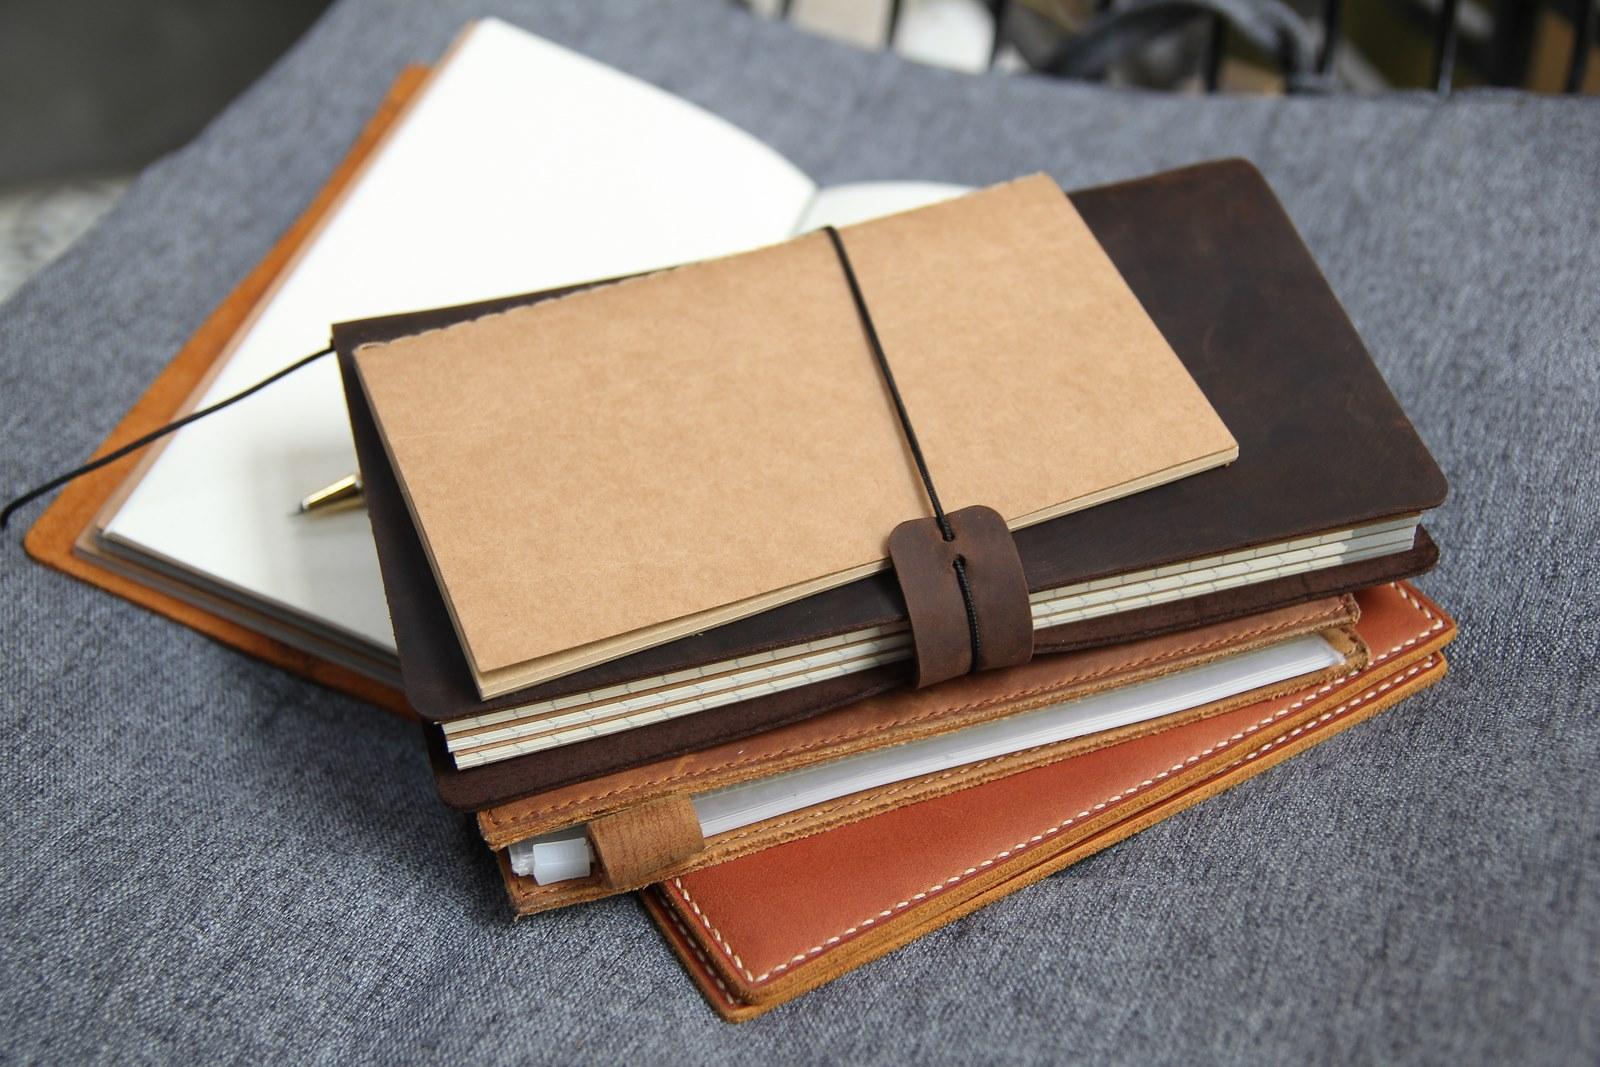 kraff-ấn phẩm từ sổ tay handmade BullNote